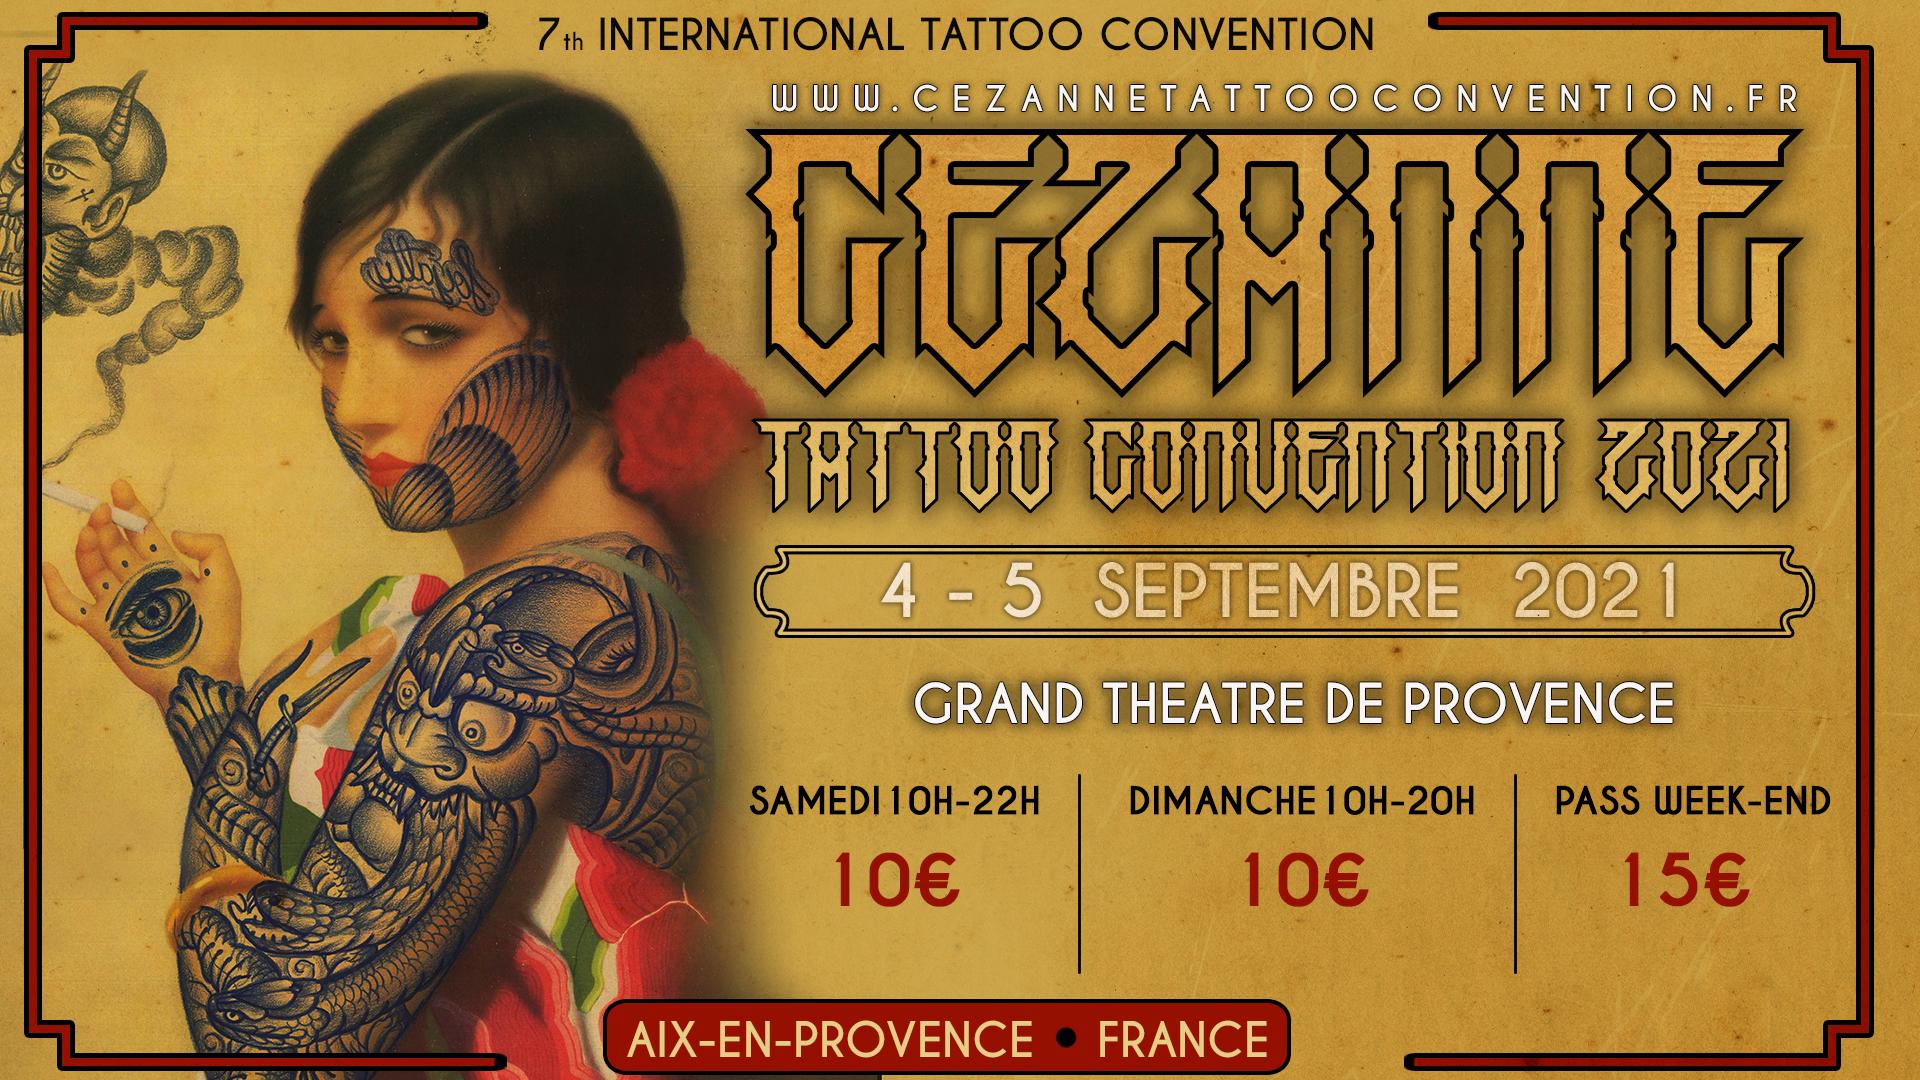 Cézanne Tattoo Convention 2021